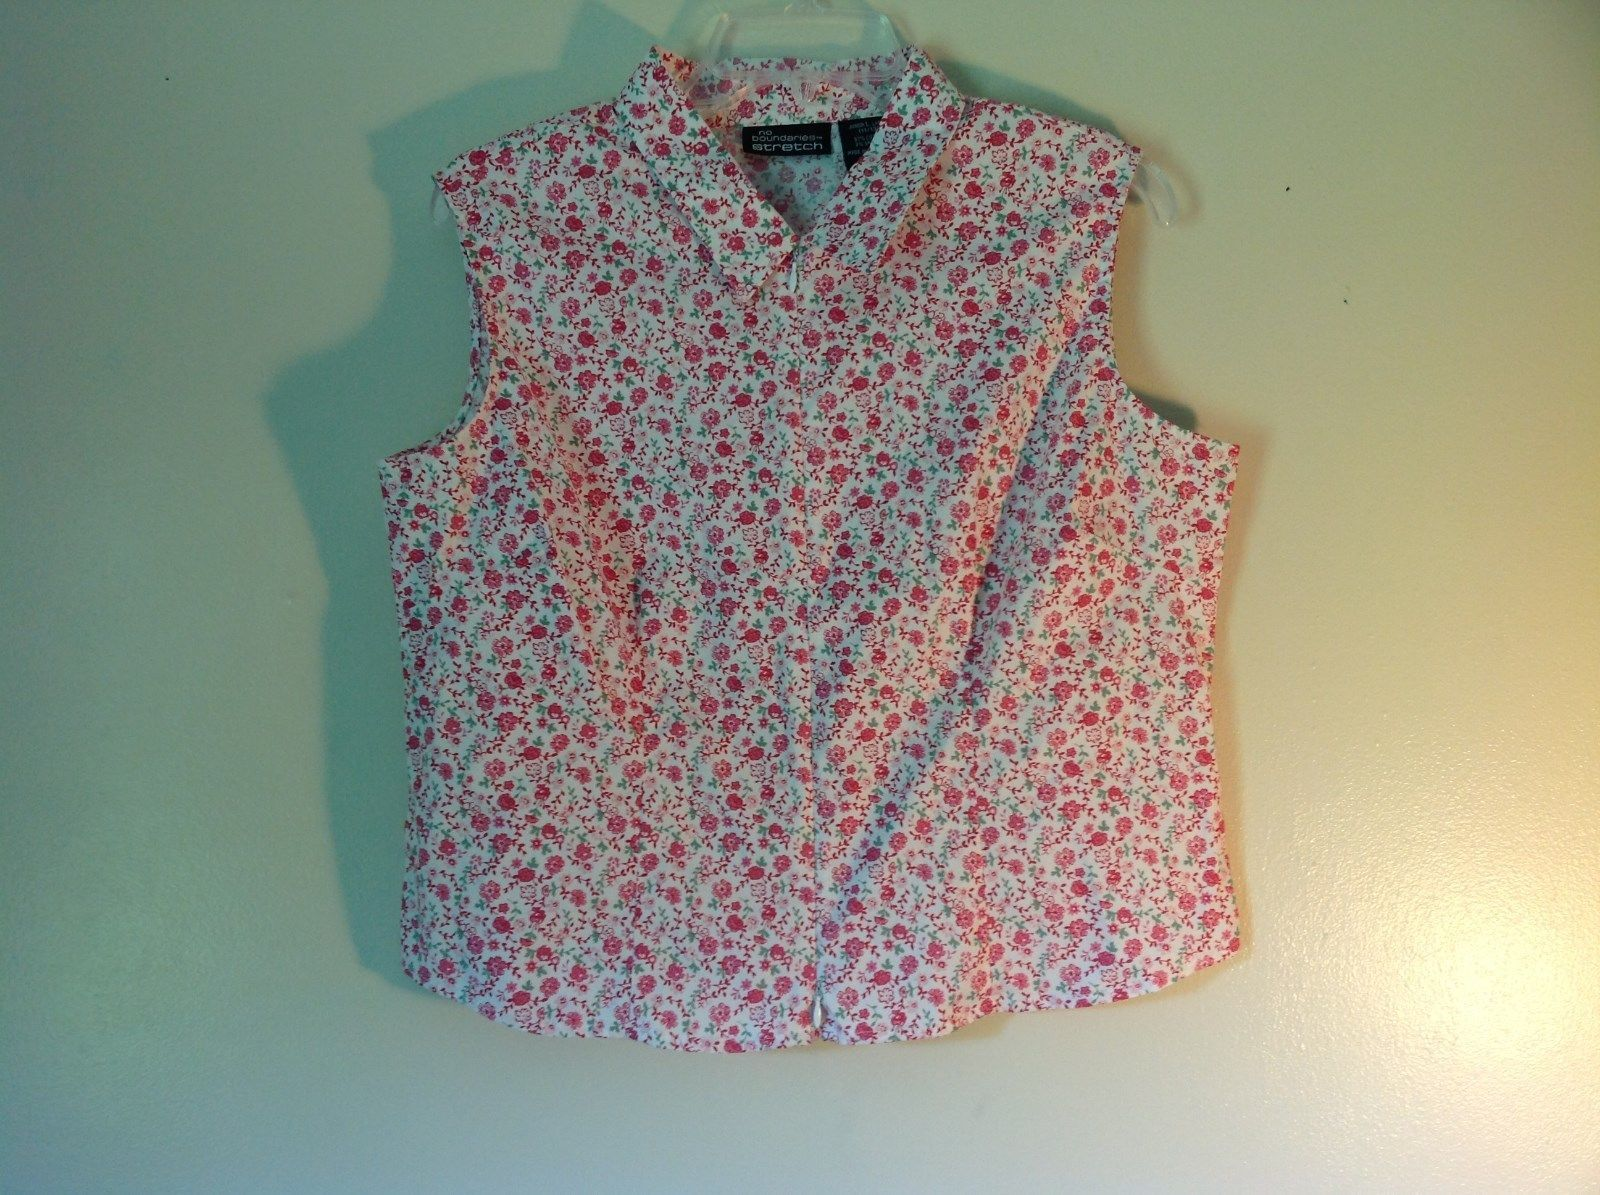 No Boundaries Stretch Junior Size Large 11 to 13 Sleeveless White Flowered Shirt